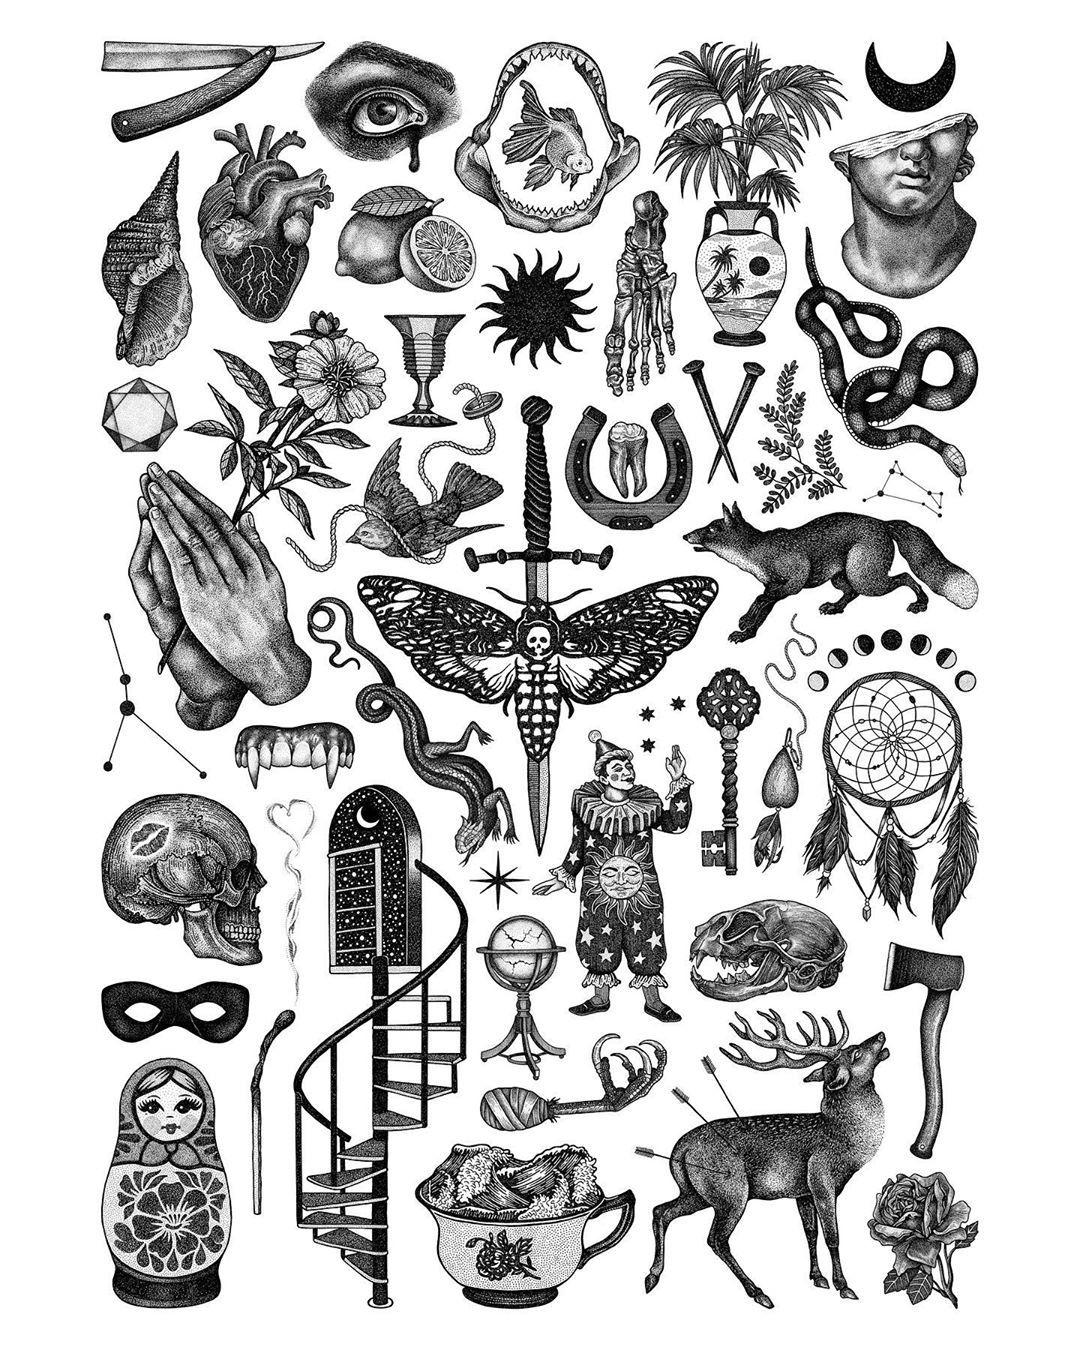 Lloyd Stratton On Instagram Rituals Live In My Store Tonight At 6pm Gmt Free Sticker Set Small Tattoos Old School Tattoo Designs Traditional Black Tattoo